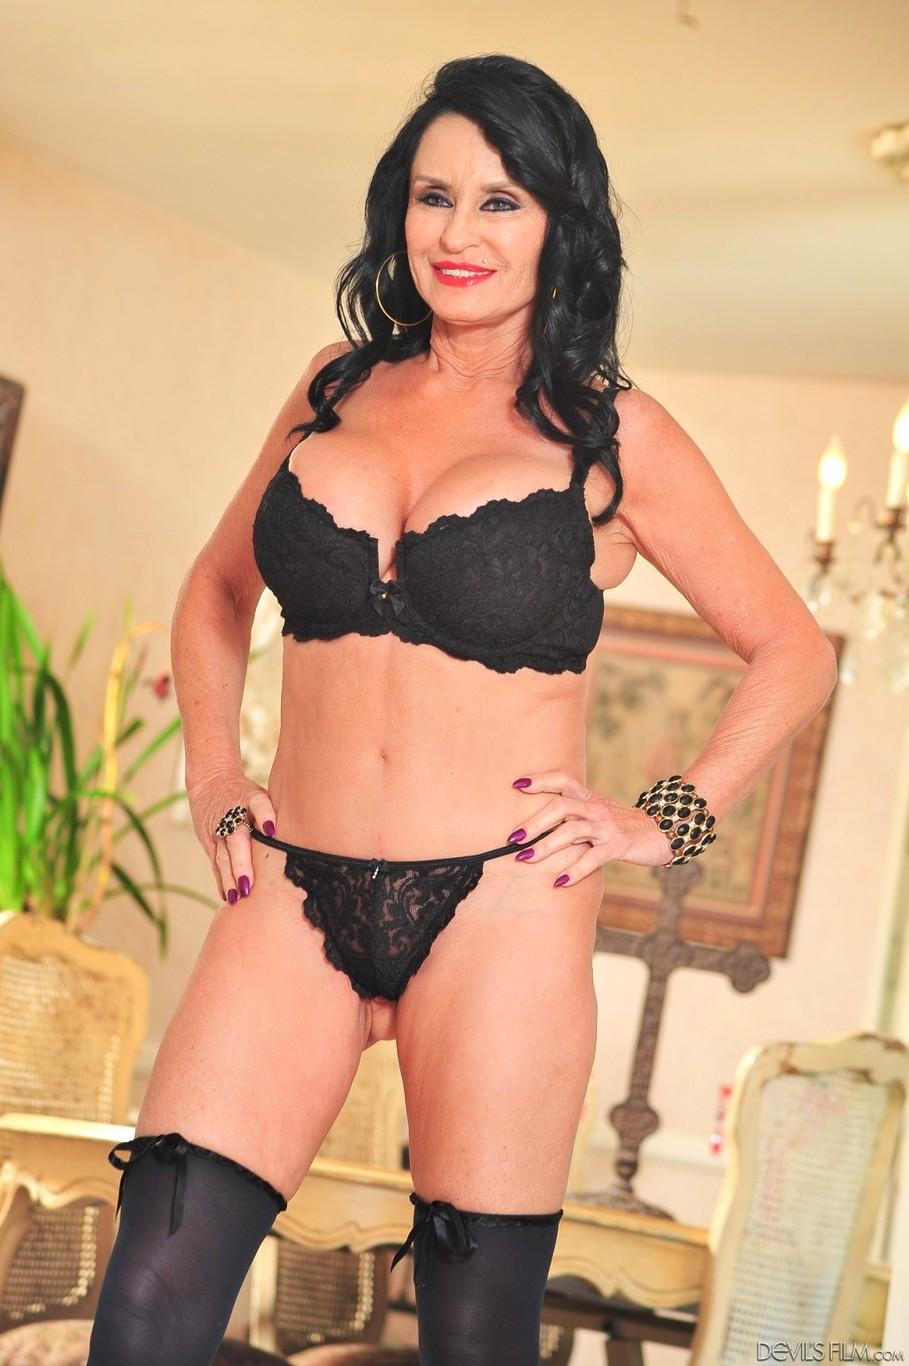 Babe Today Devils Film Rita Daniels Fresh Mature Xxxstar -7994